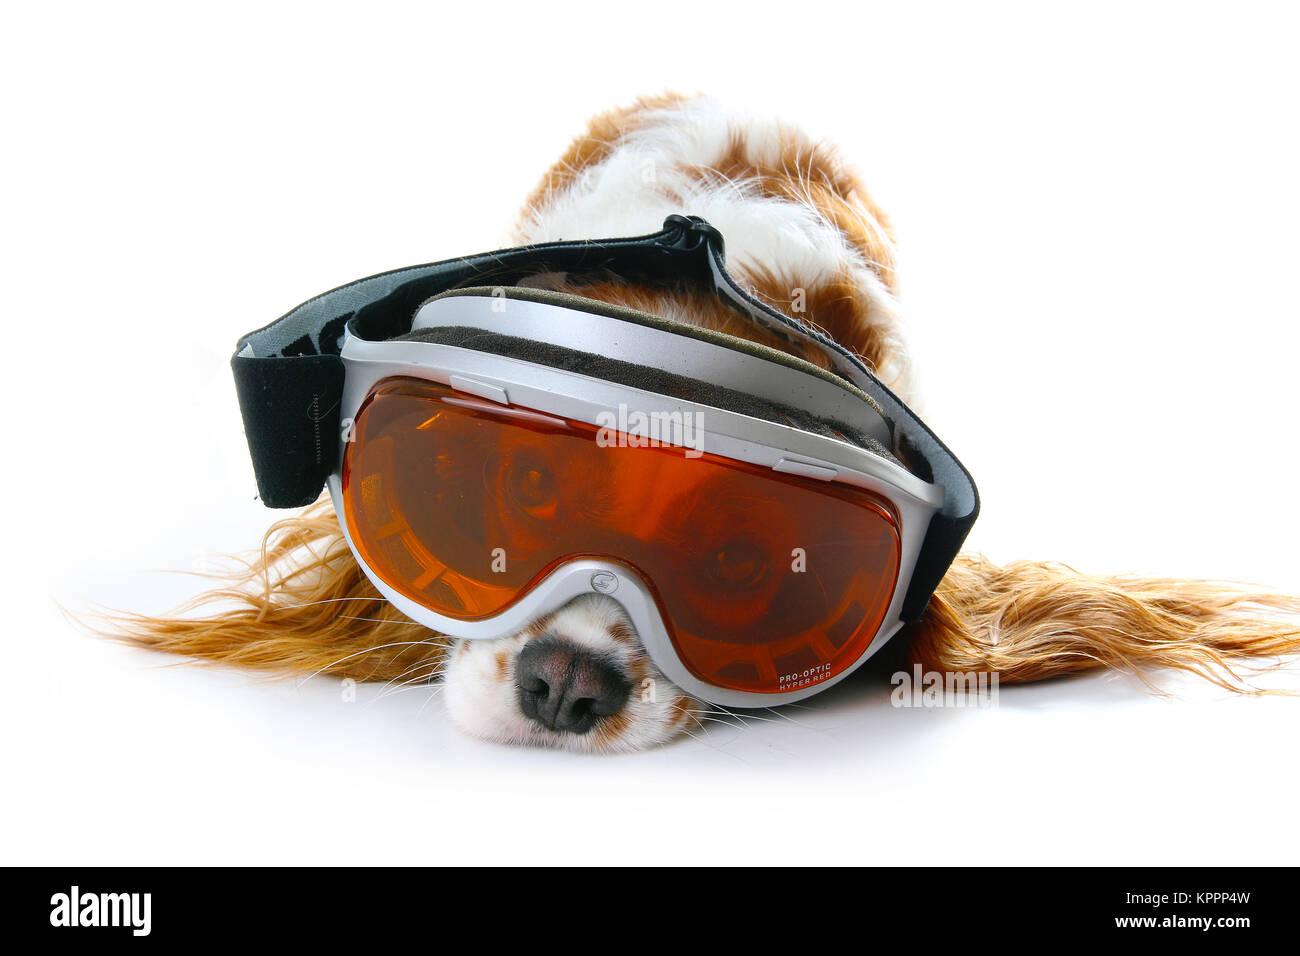 Dog with skiing ski eyewear eye mask sunglasses accessories. Cute illustration. - Stock Image